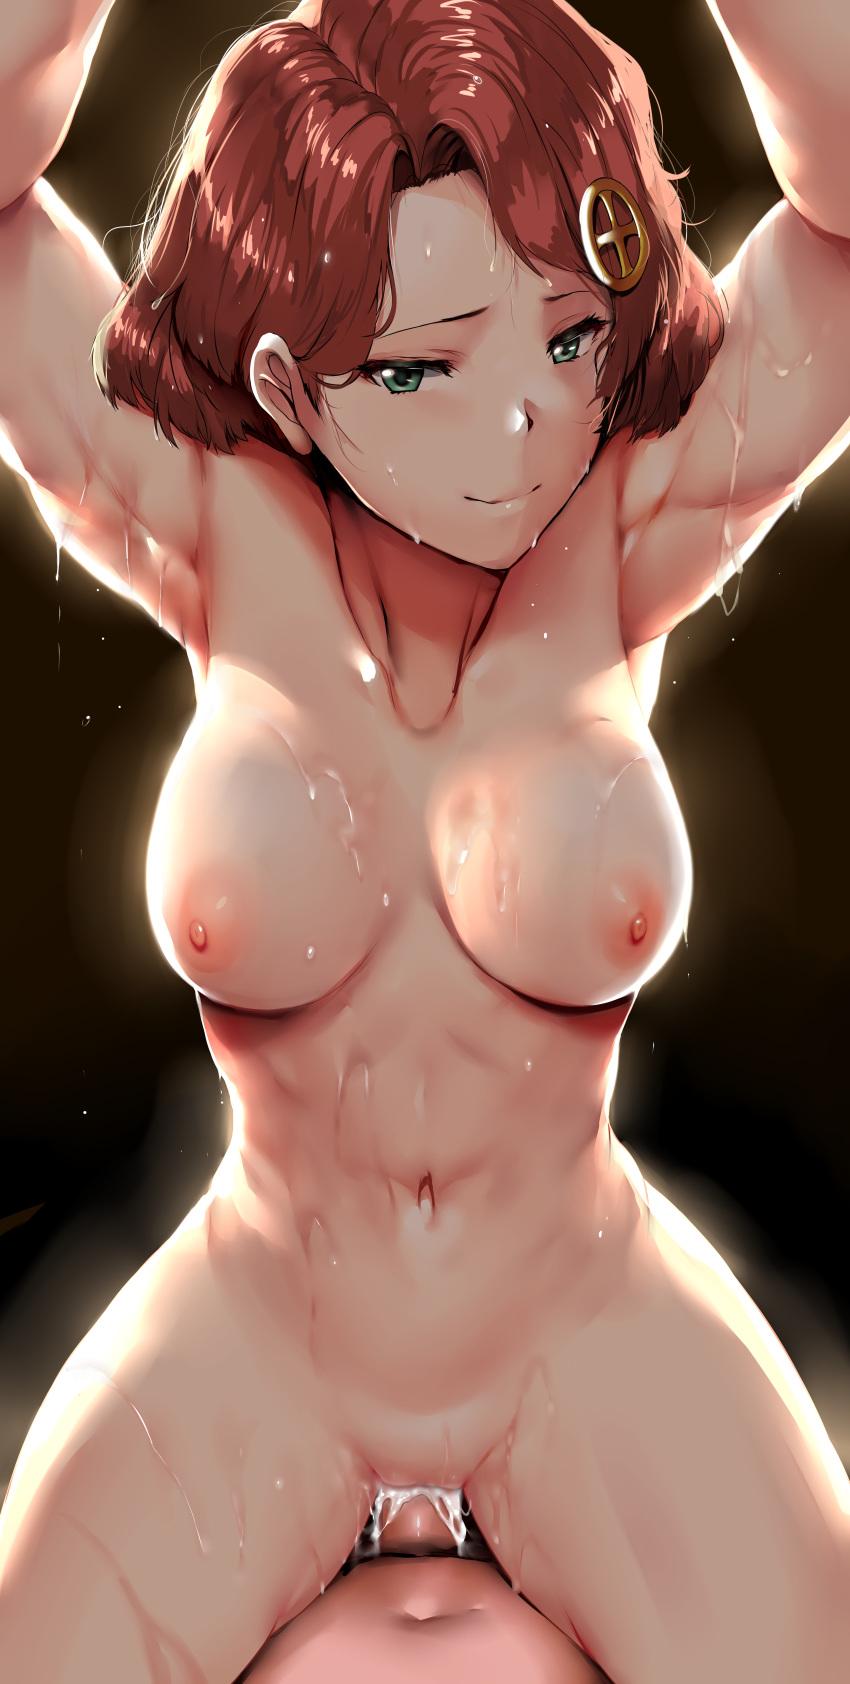 kabaneri koutetsujou no Star wars tumblr